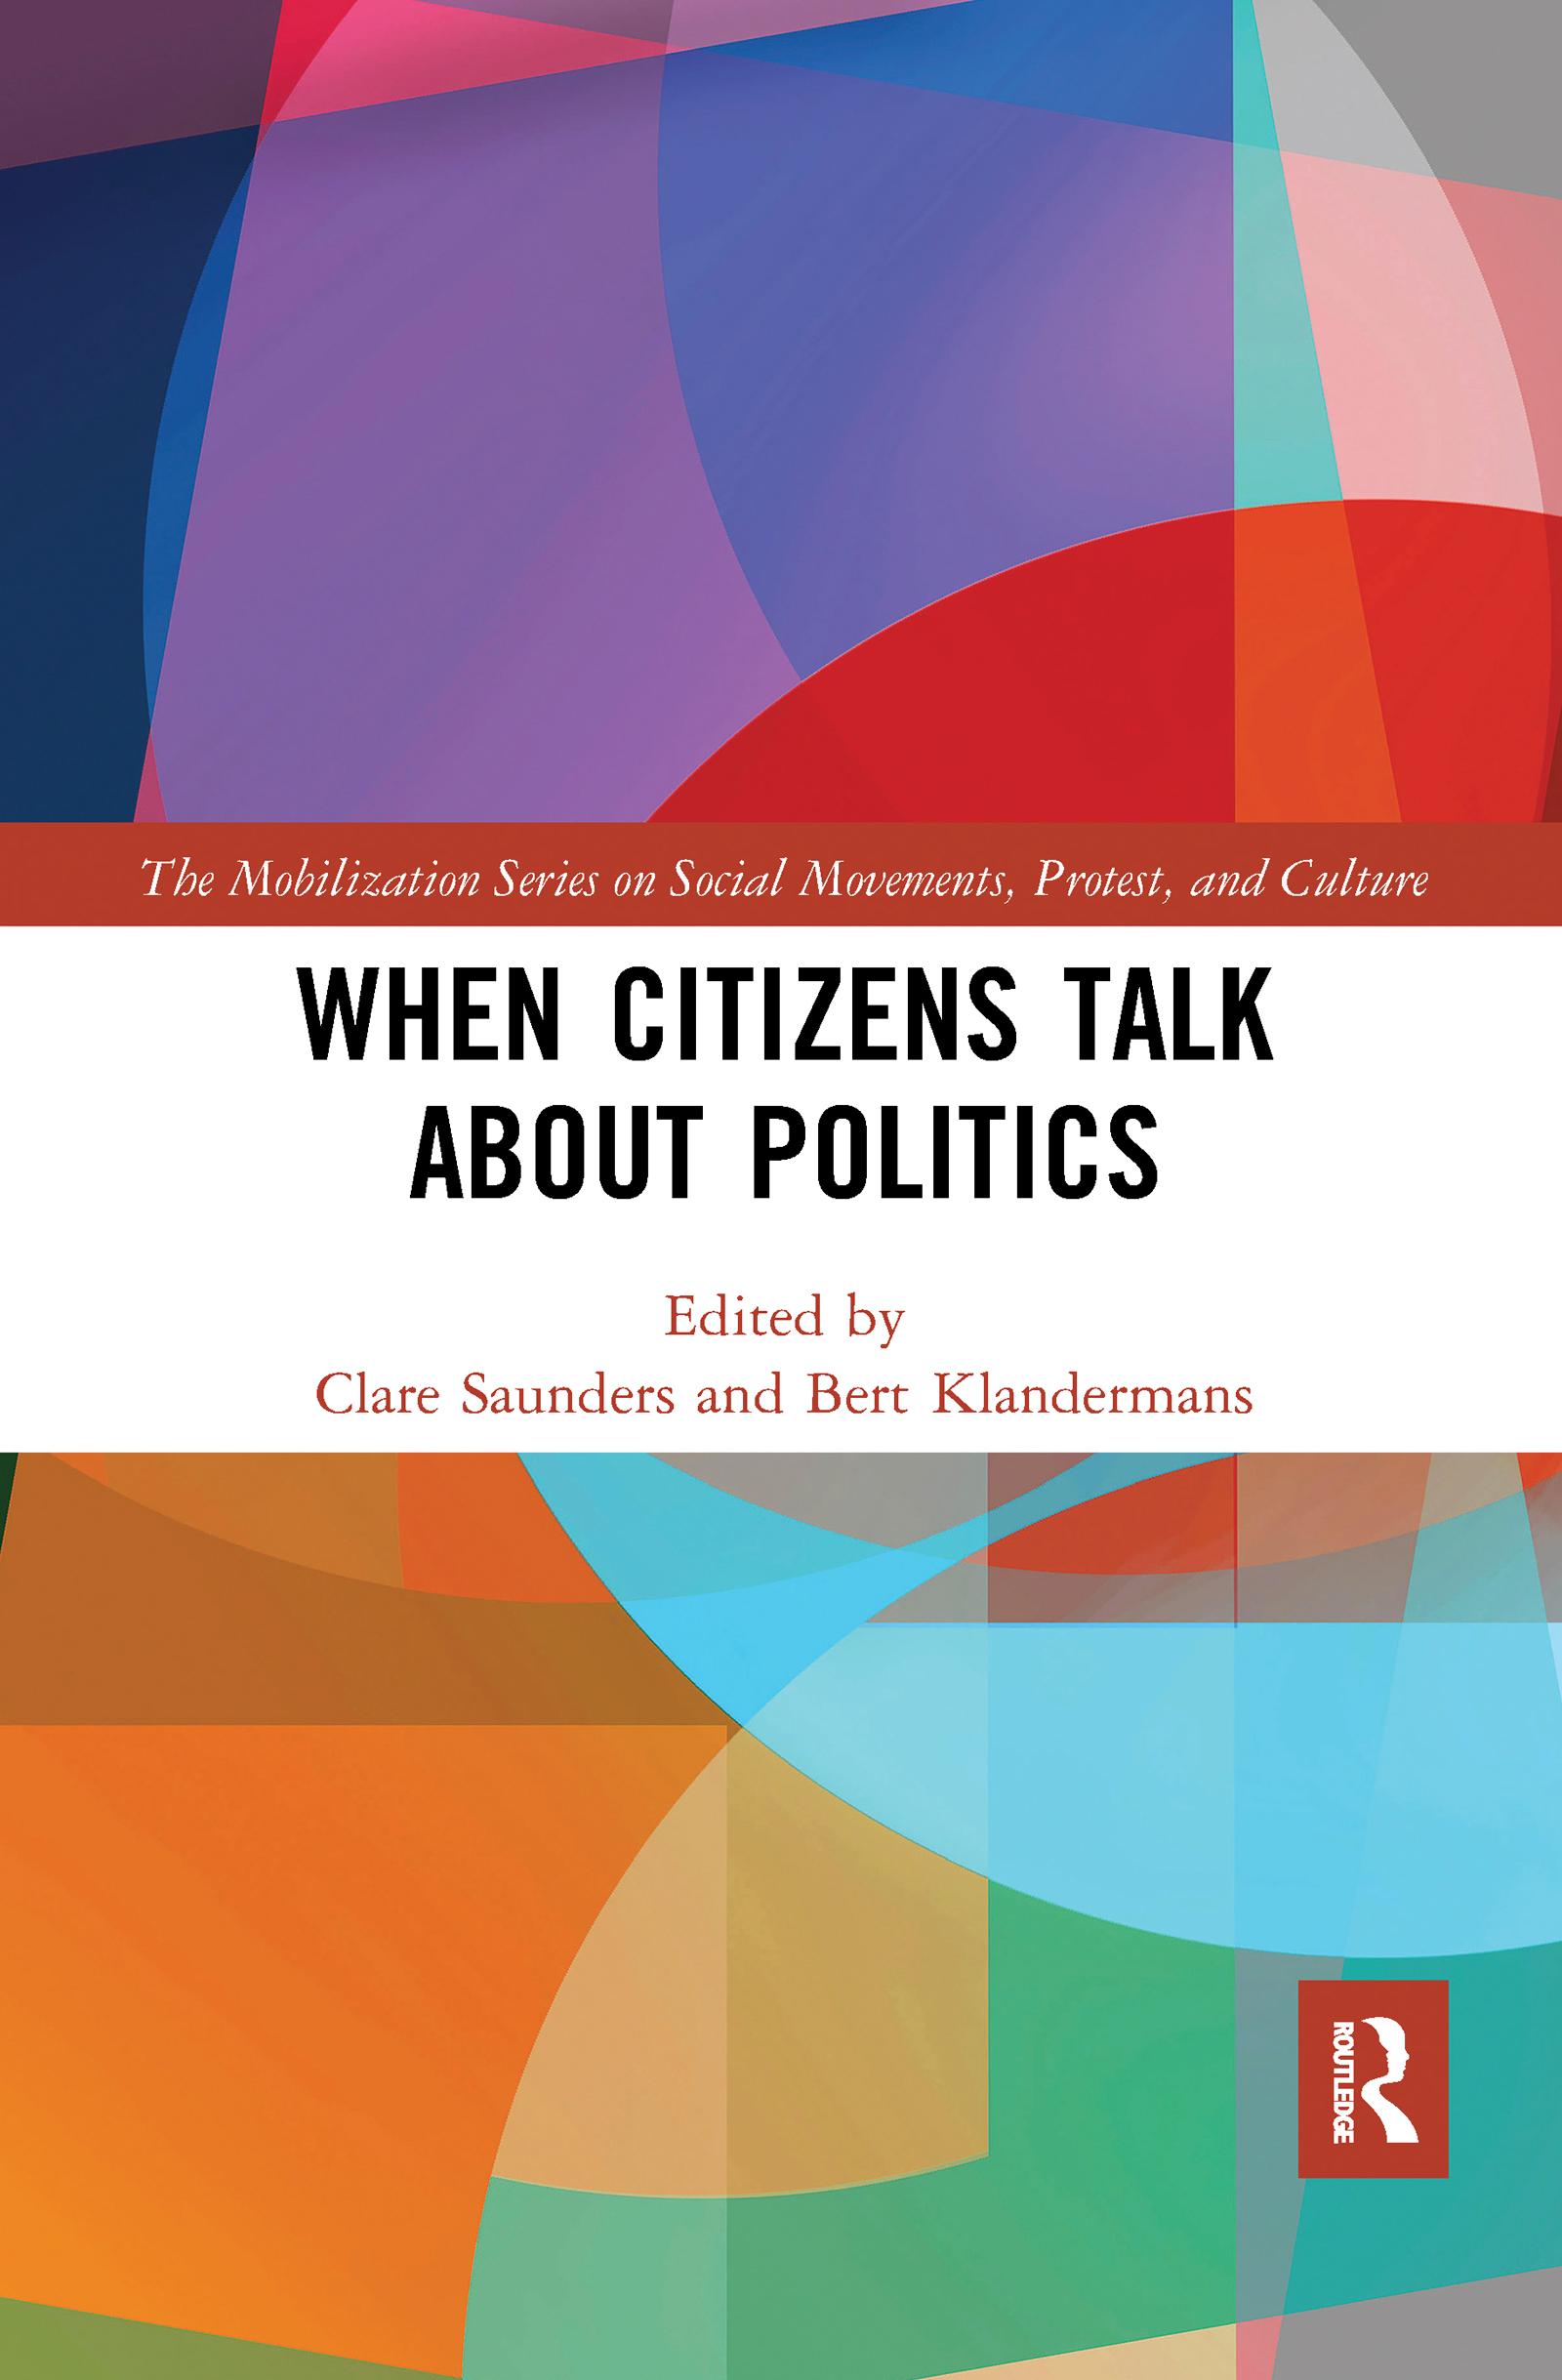 When Citizens Talk About Politics